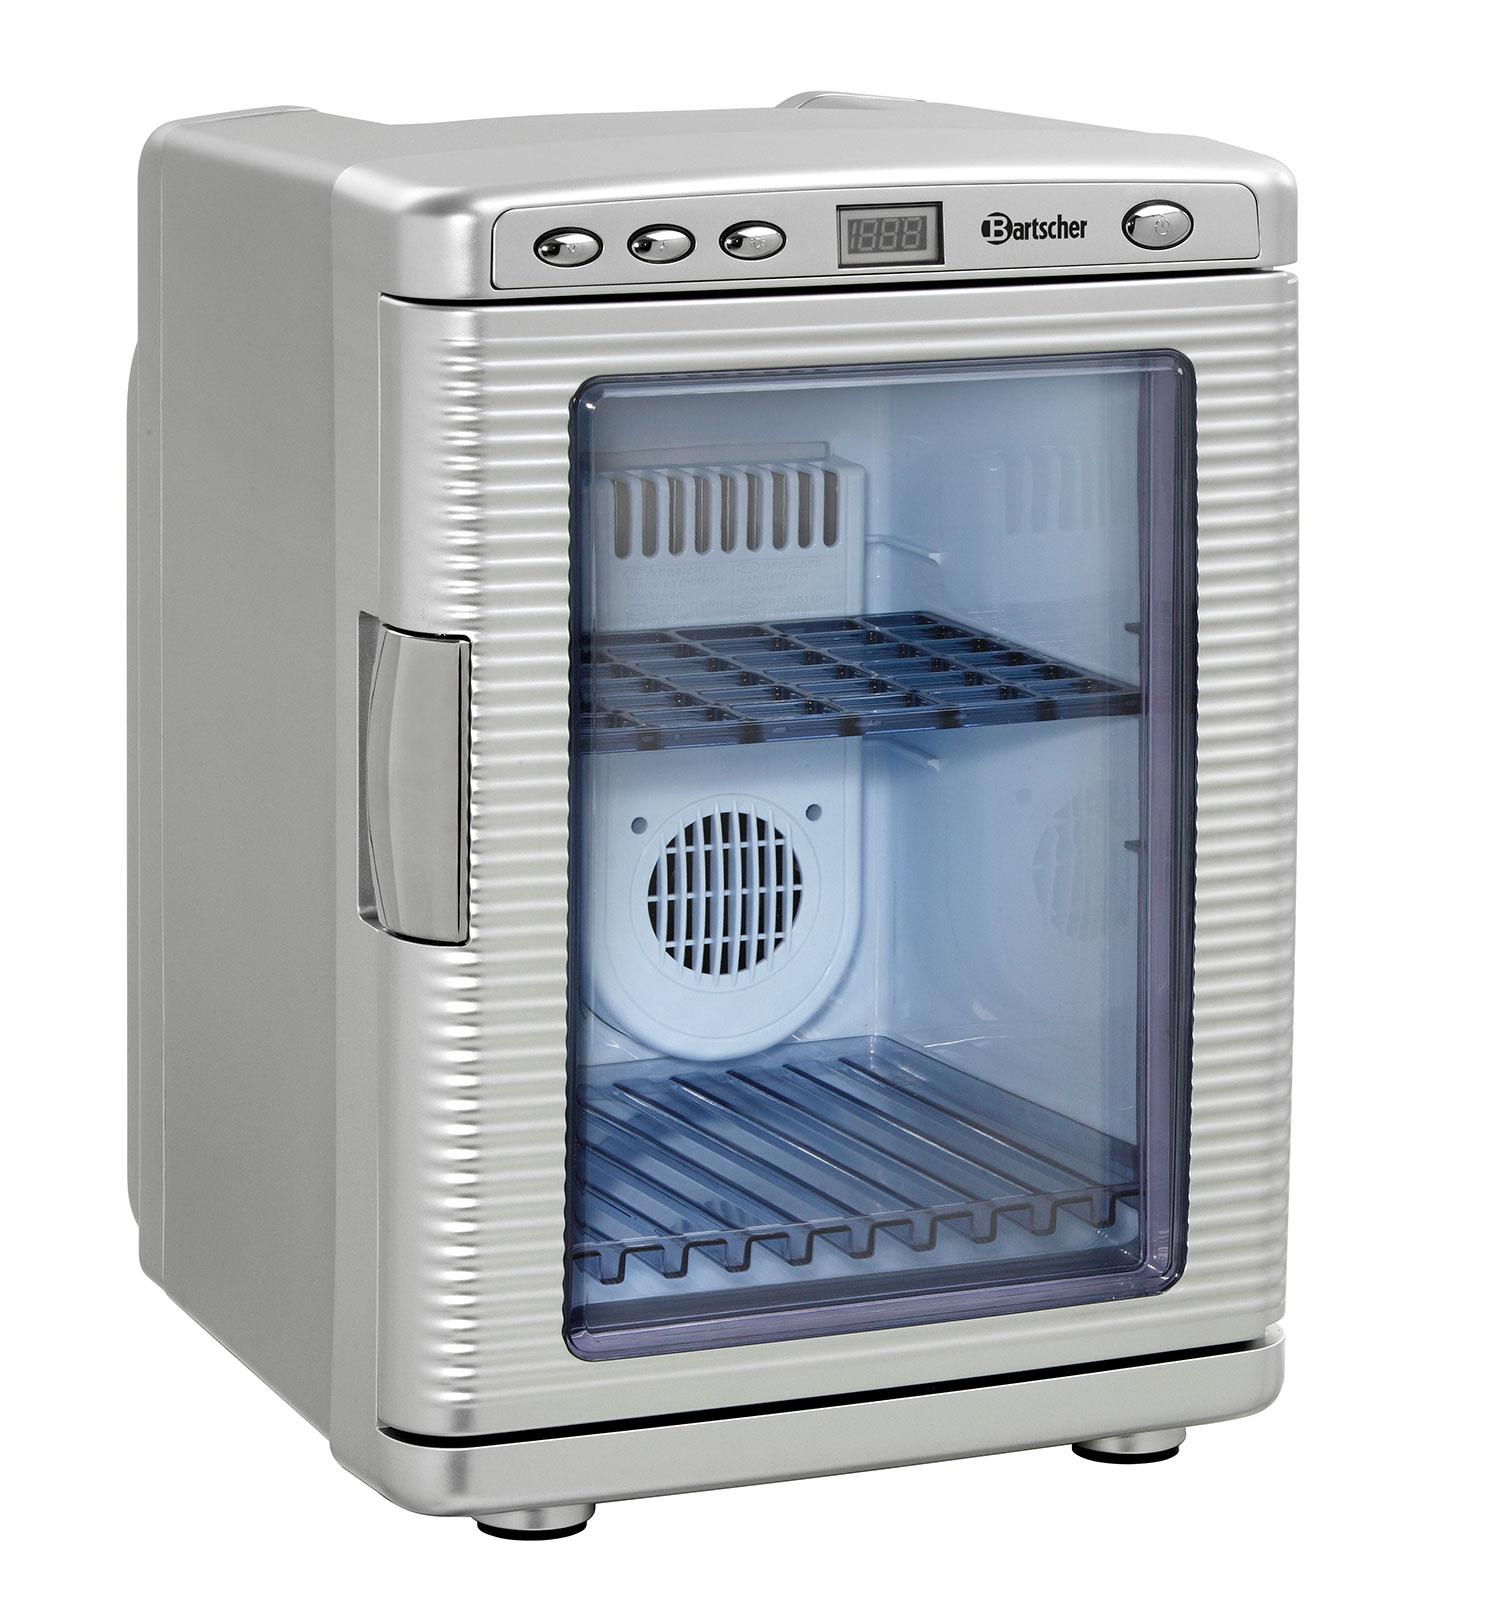 Bartscher Kühlschrank Mini 19 L    BATANIA DIRECT